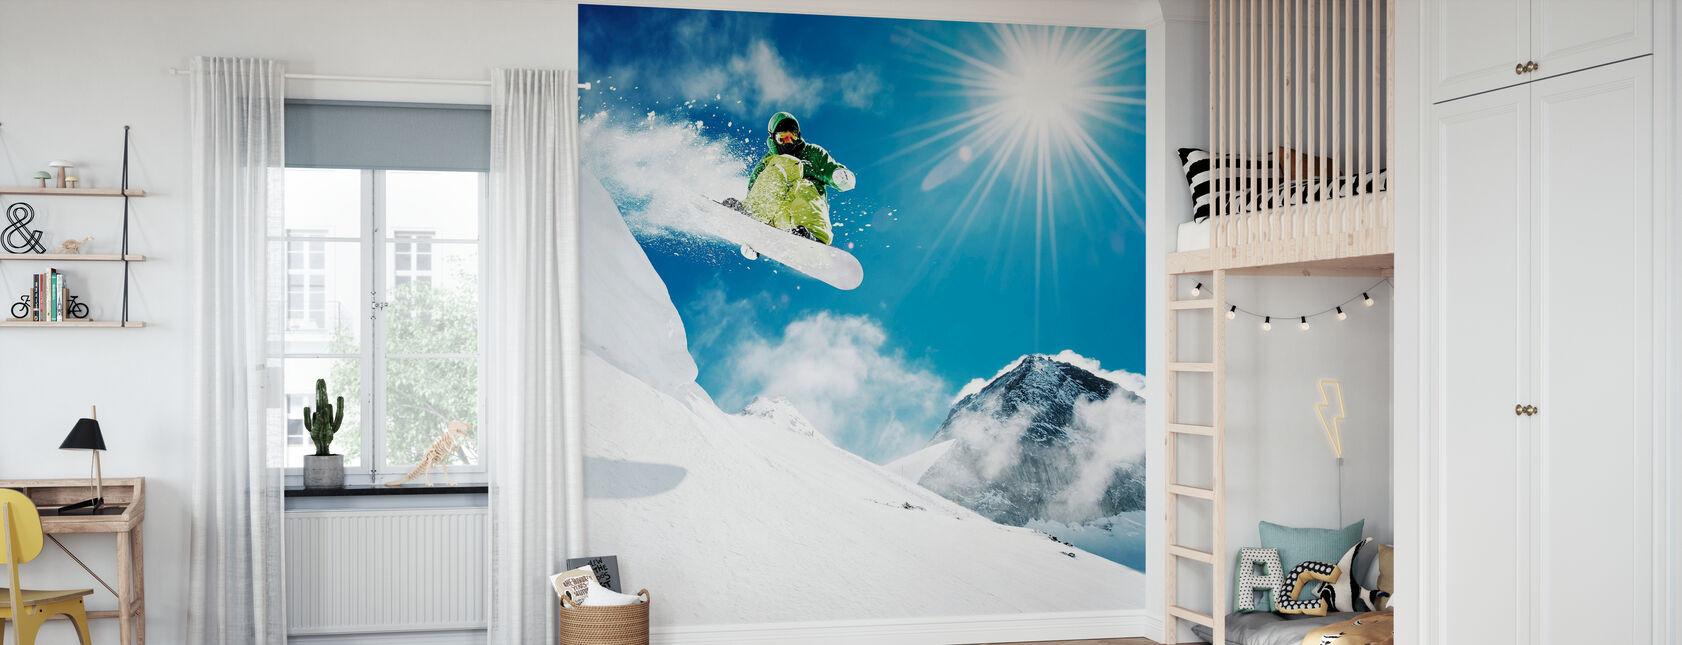 Snowboarder at Jump - Wallpaper - Kids Room